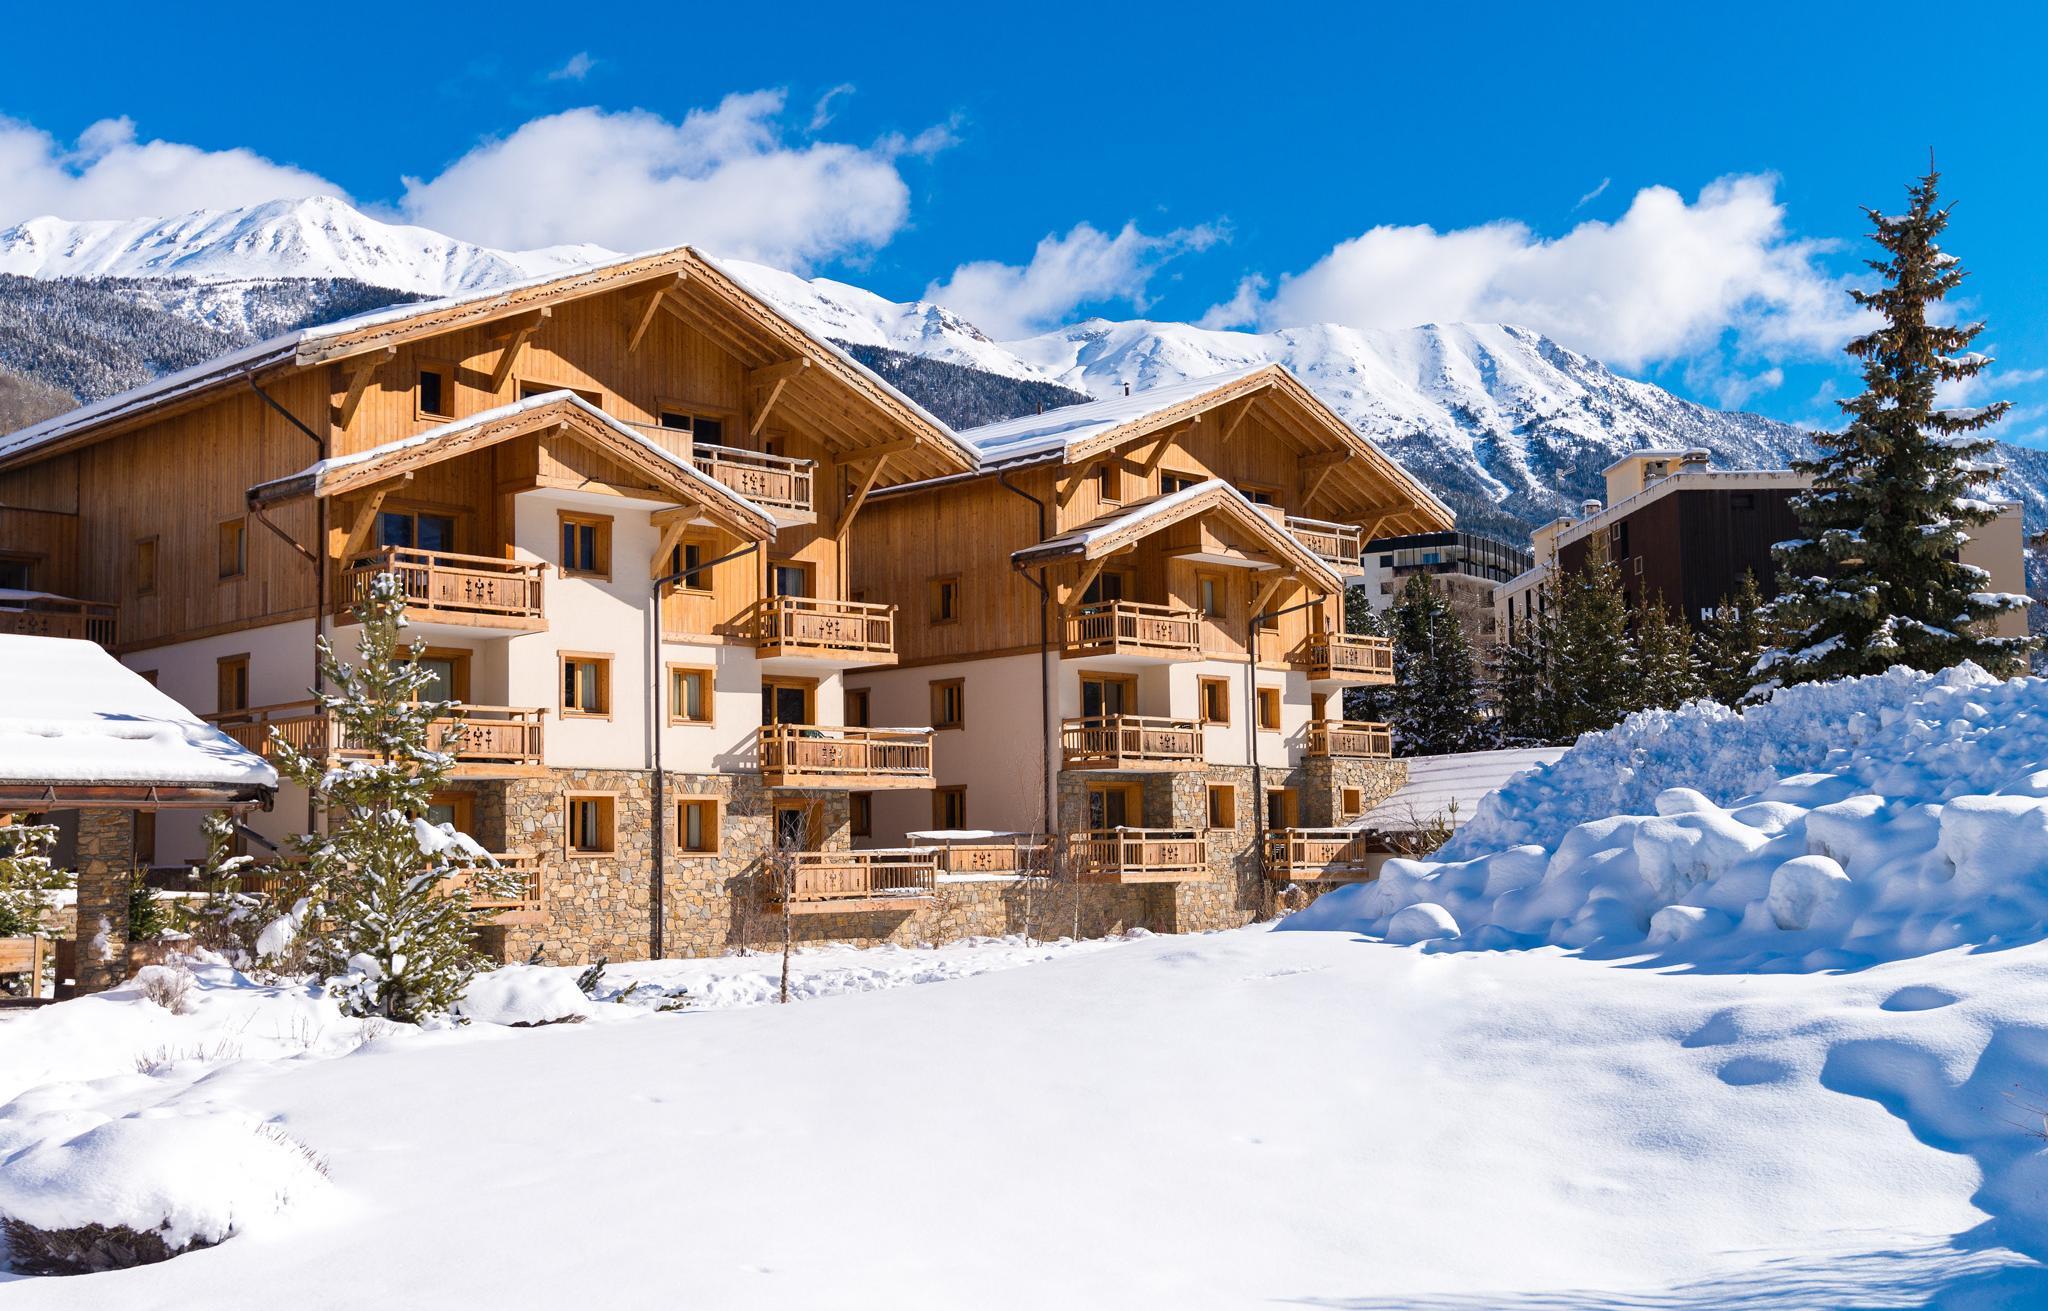 Meer info over Résidence Le Hameau du Rocher Blanc  bij Summittravel